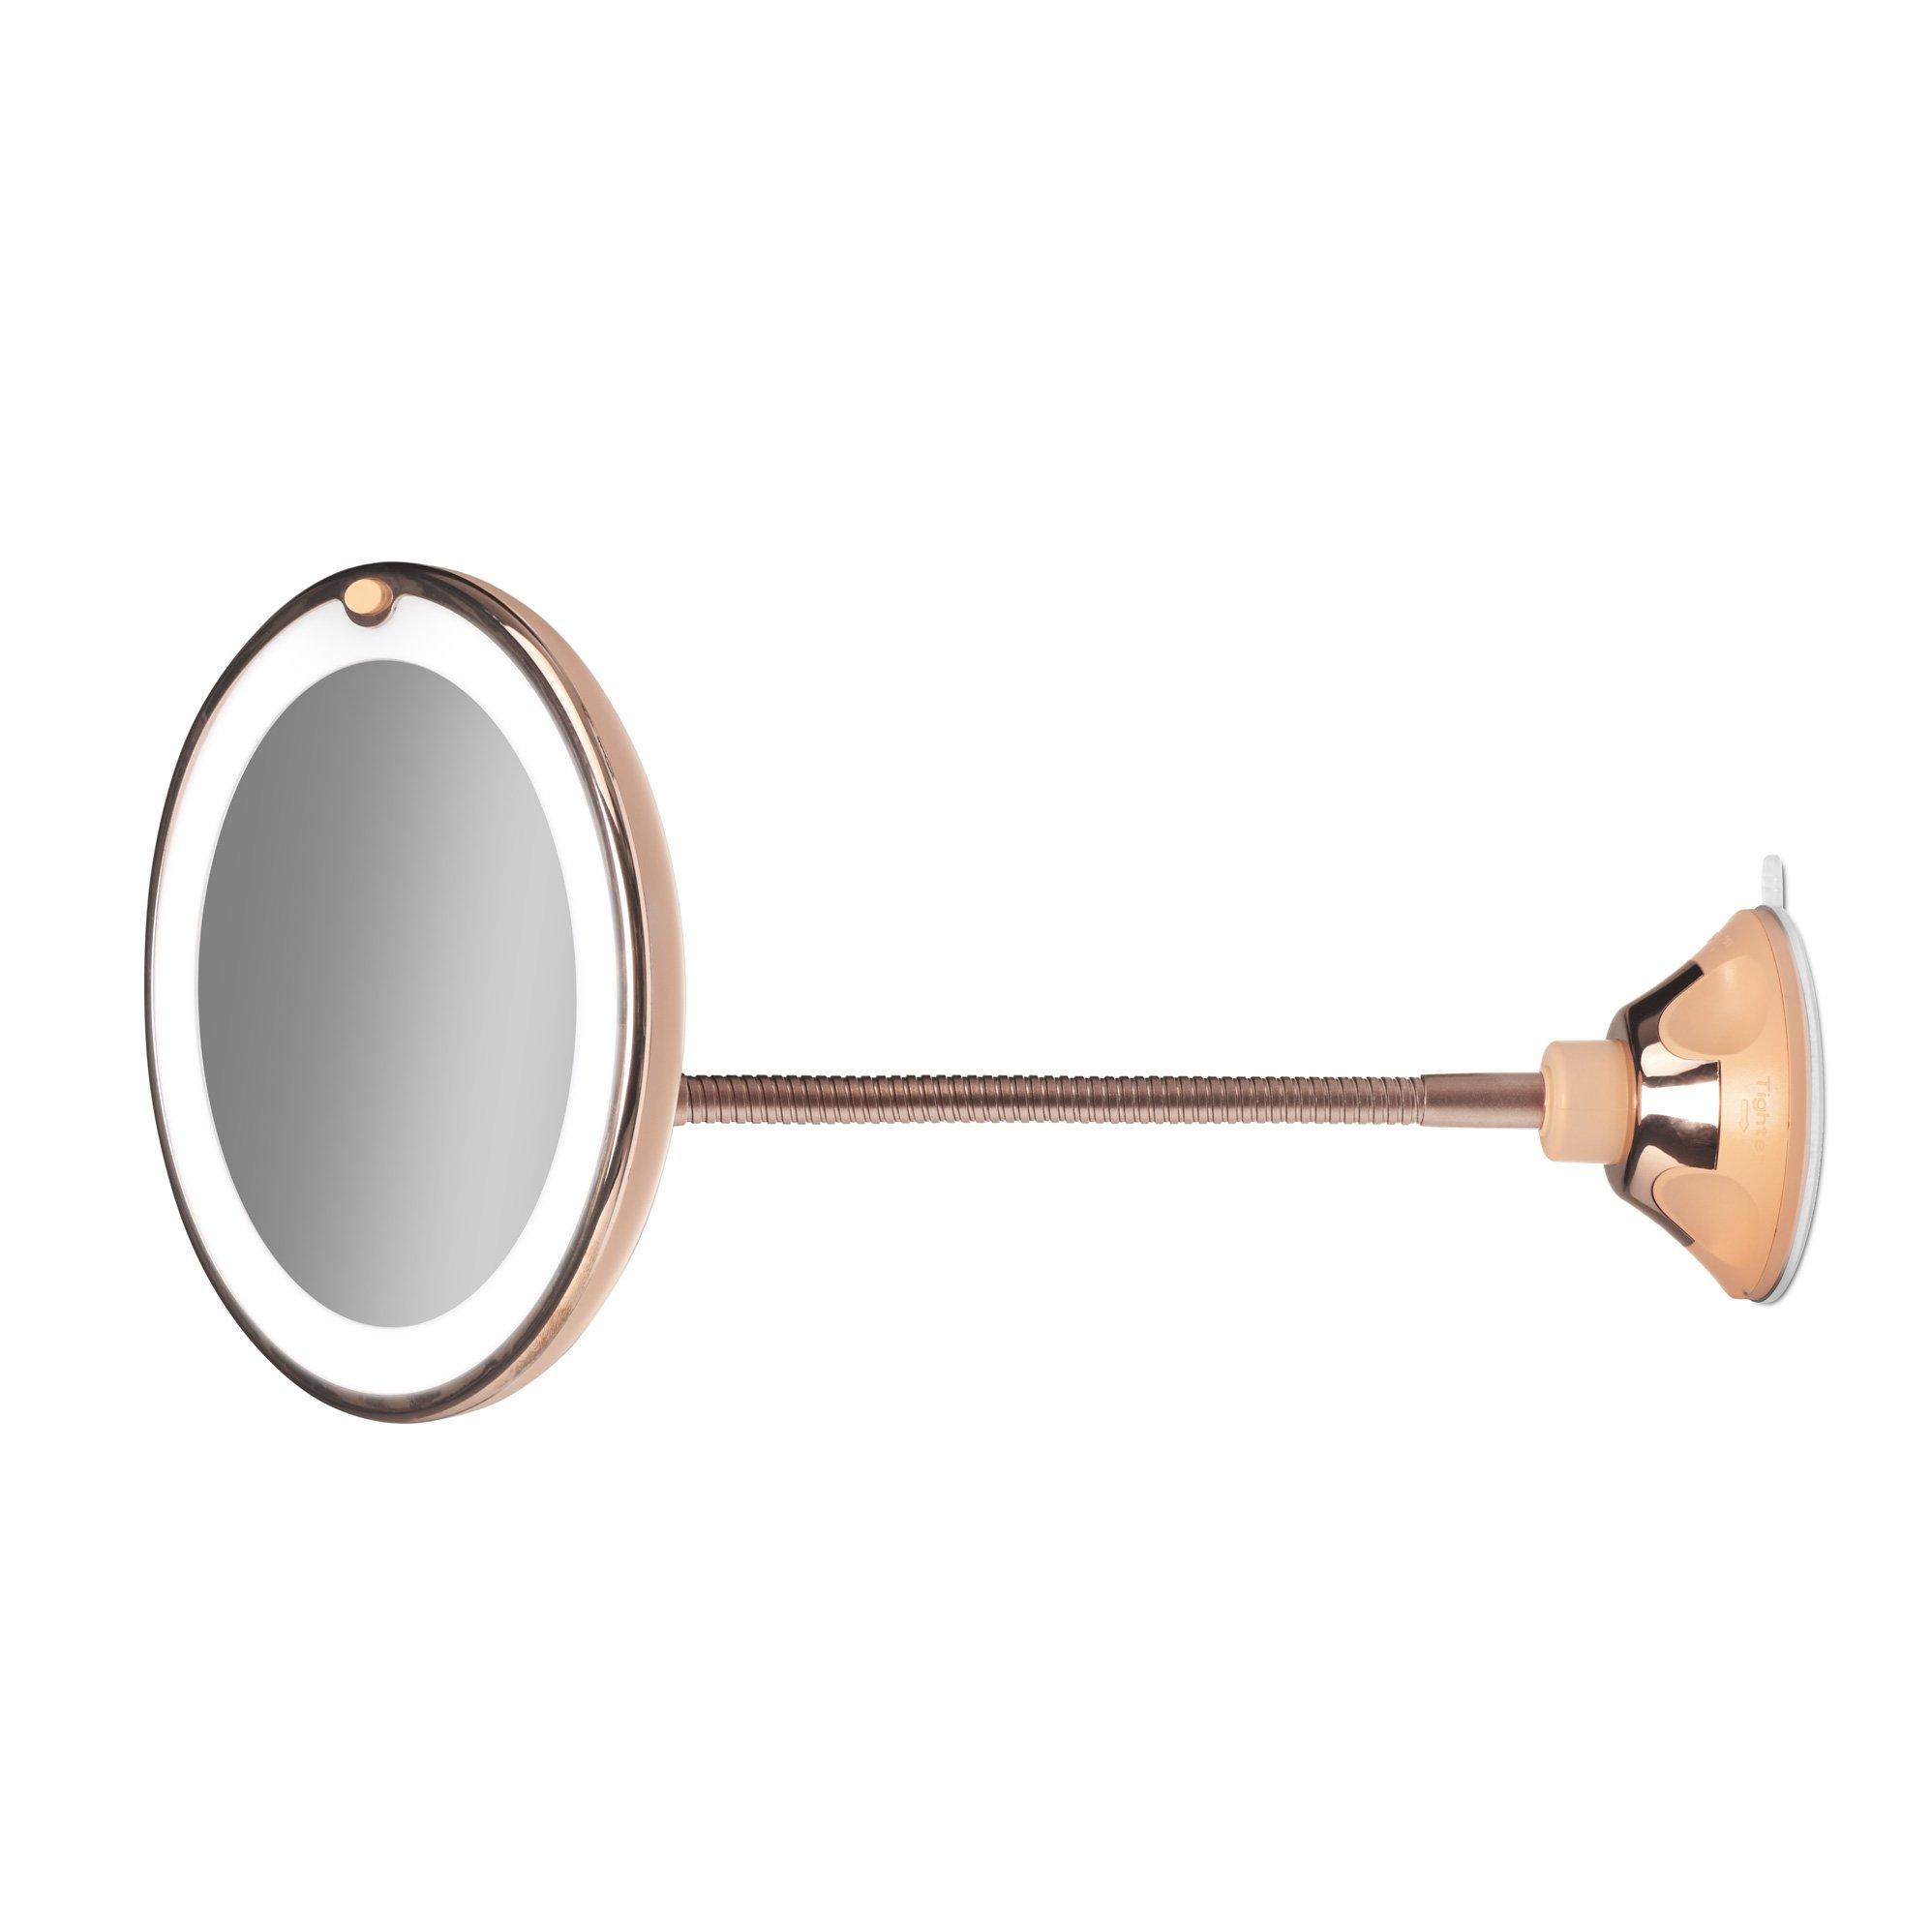 "Gillian Jones - Rosegold Suctionmirror w. Adjustable ""Goose Neck"" & LED Light"